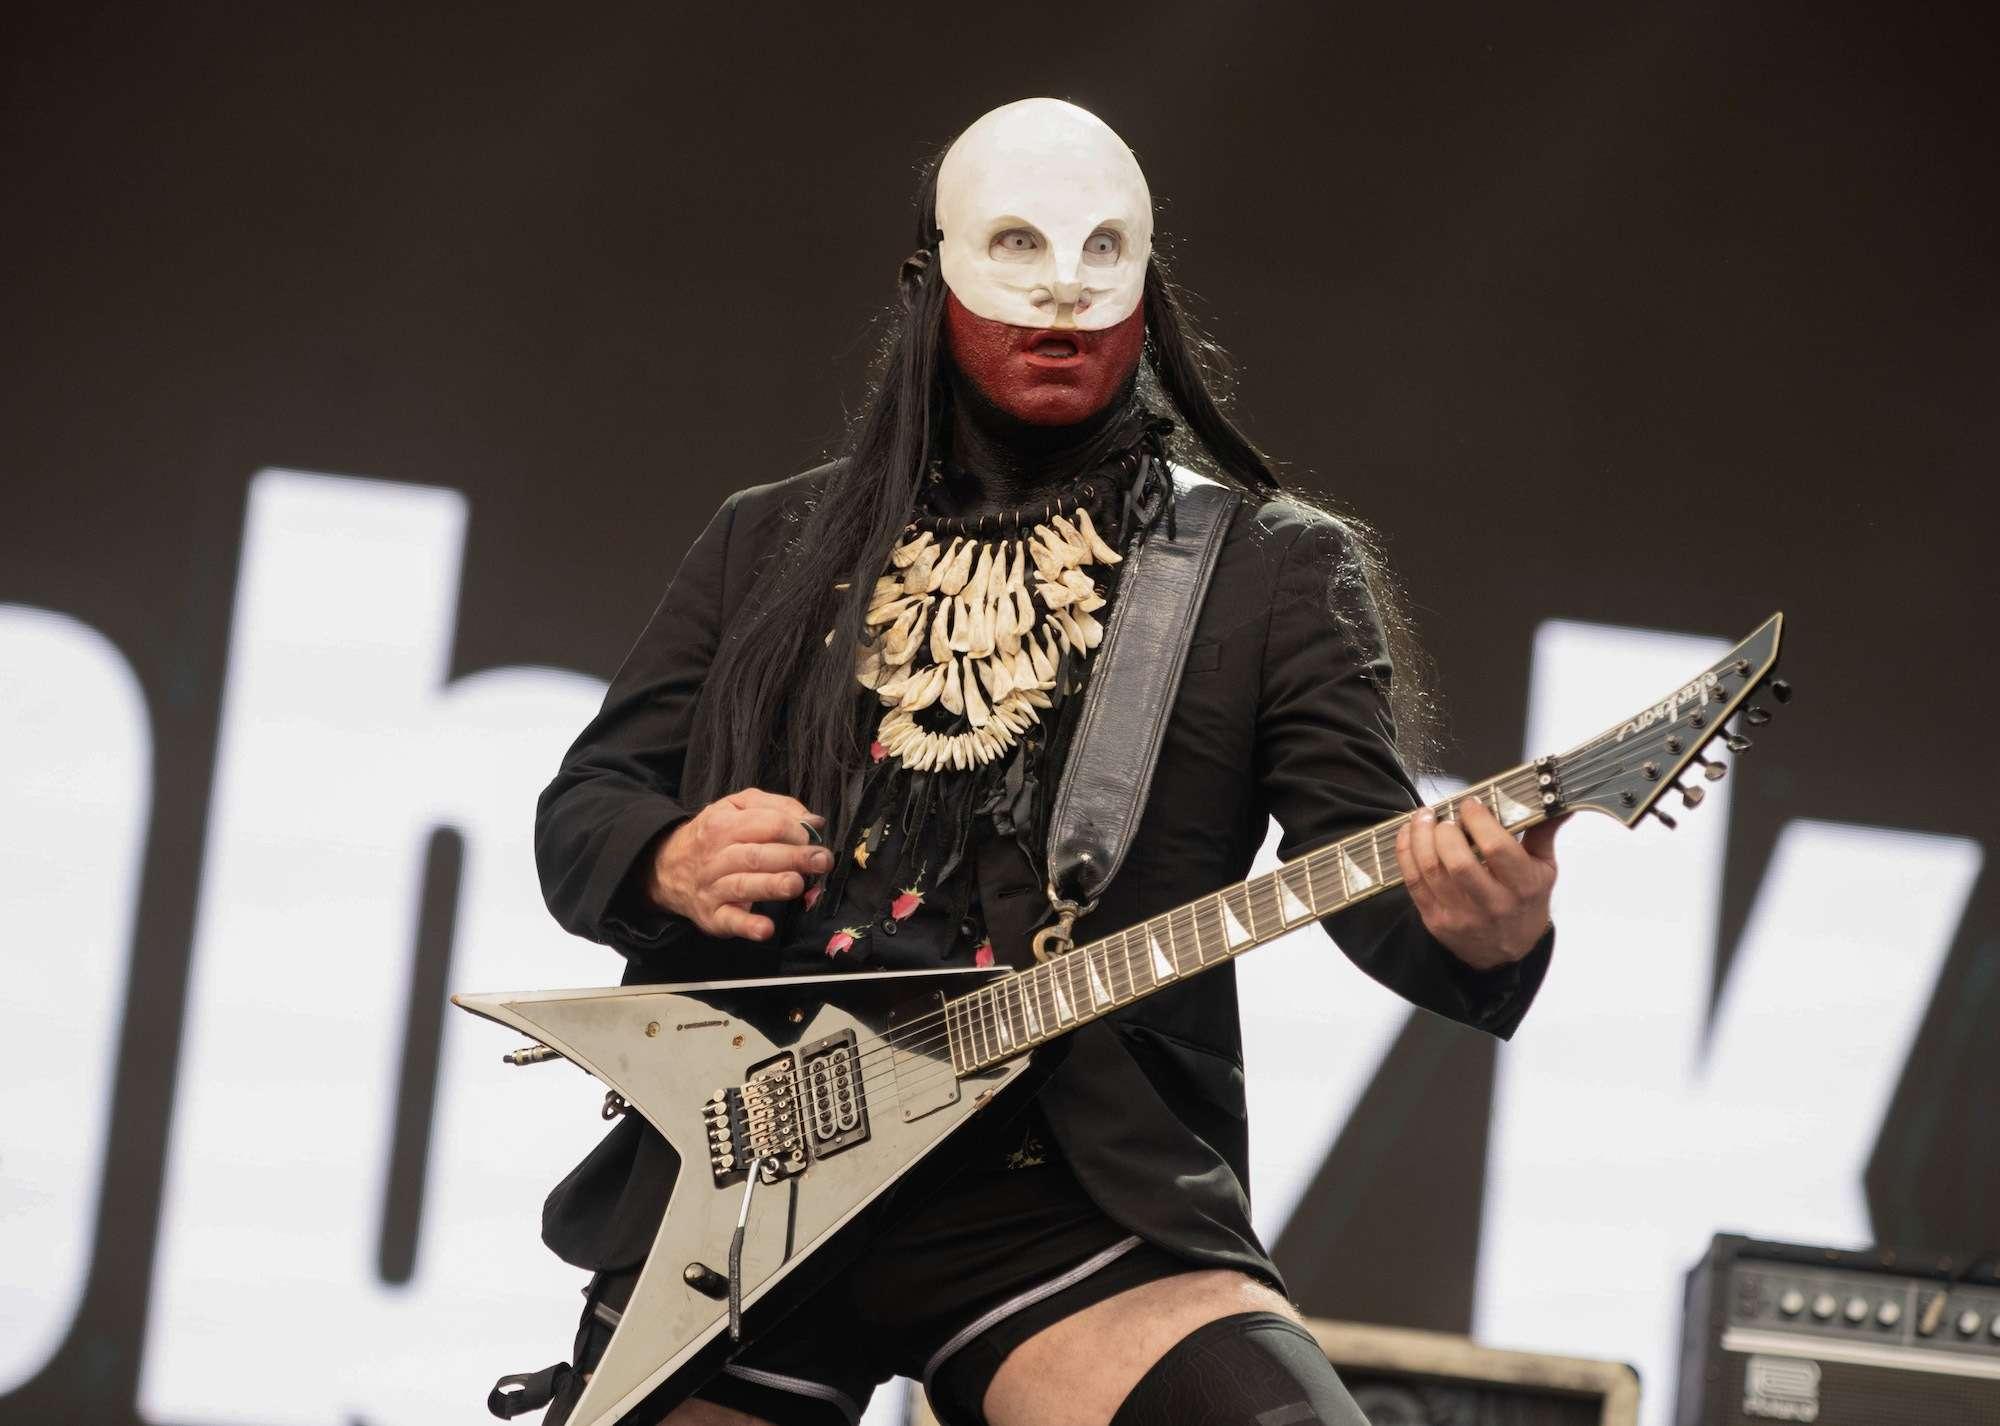 Limp Bizkit Live at Lollapalooza [GALLERY] 28